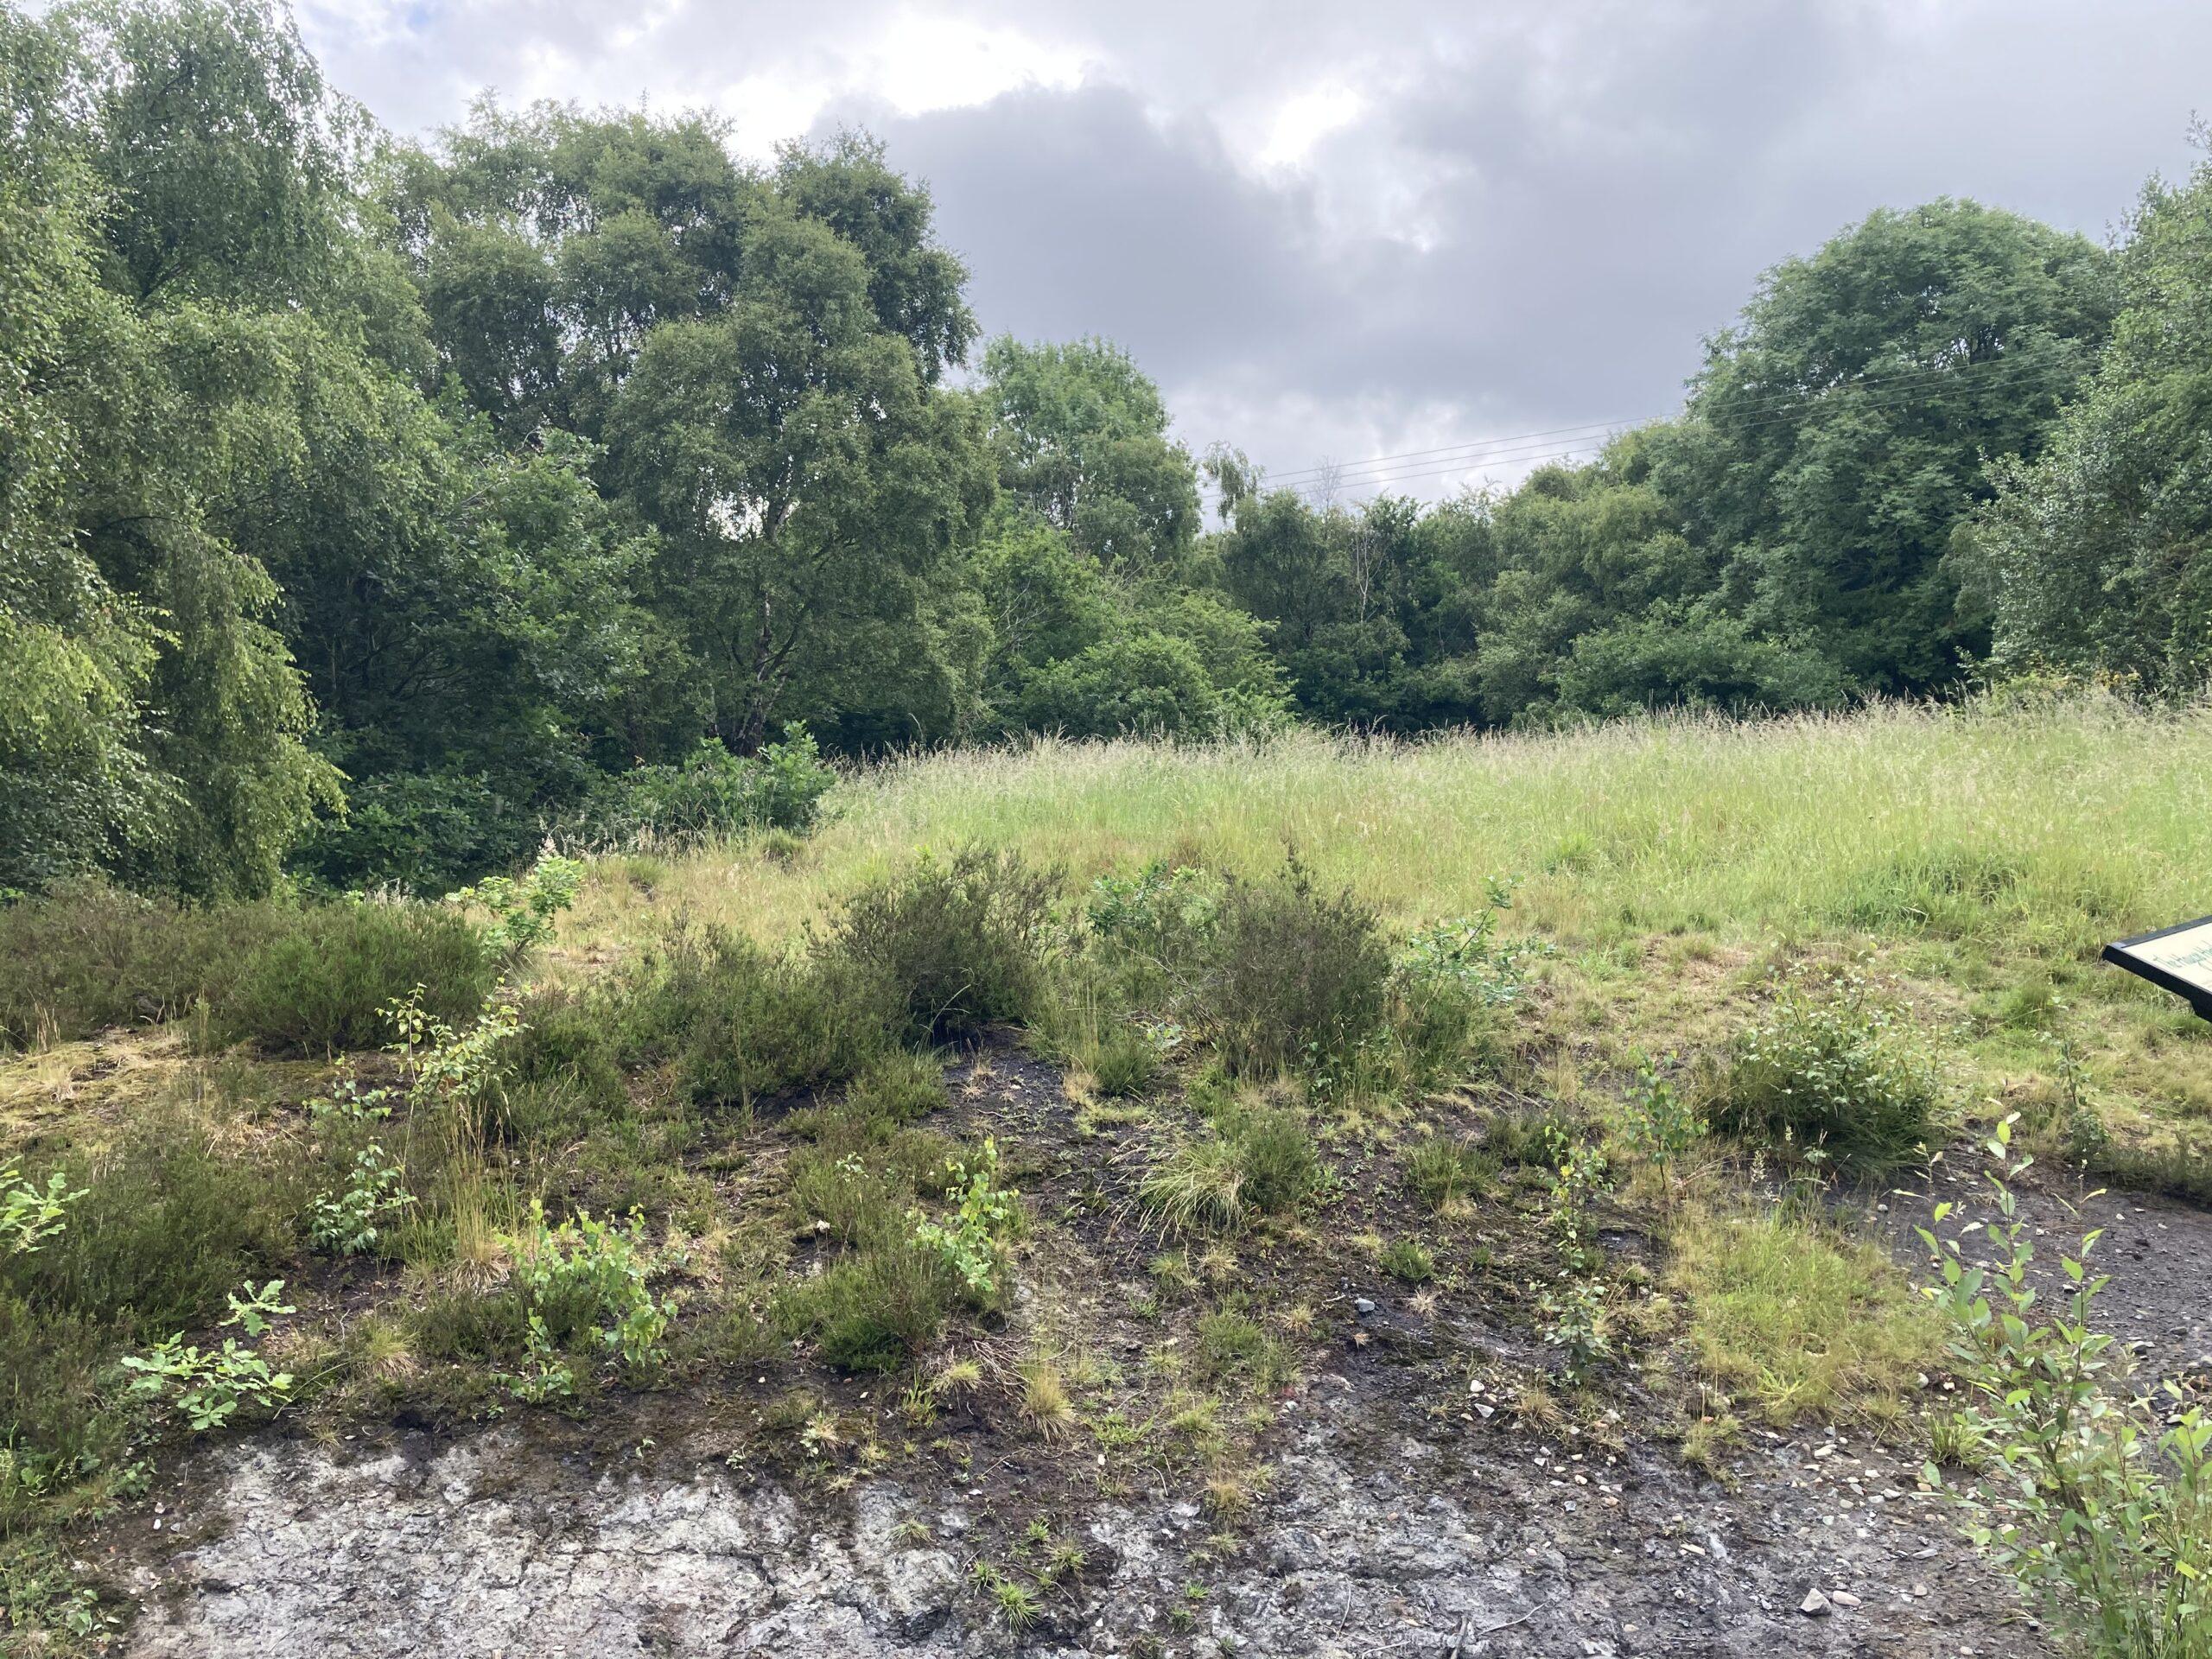 The Heath - June